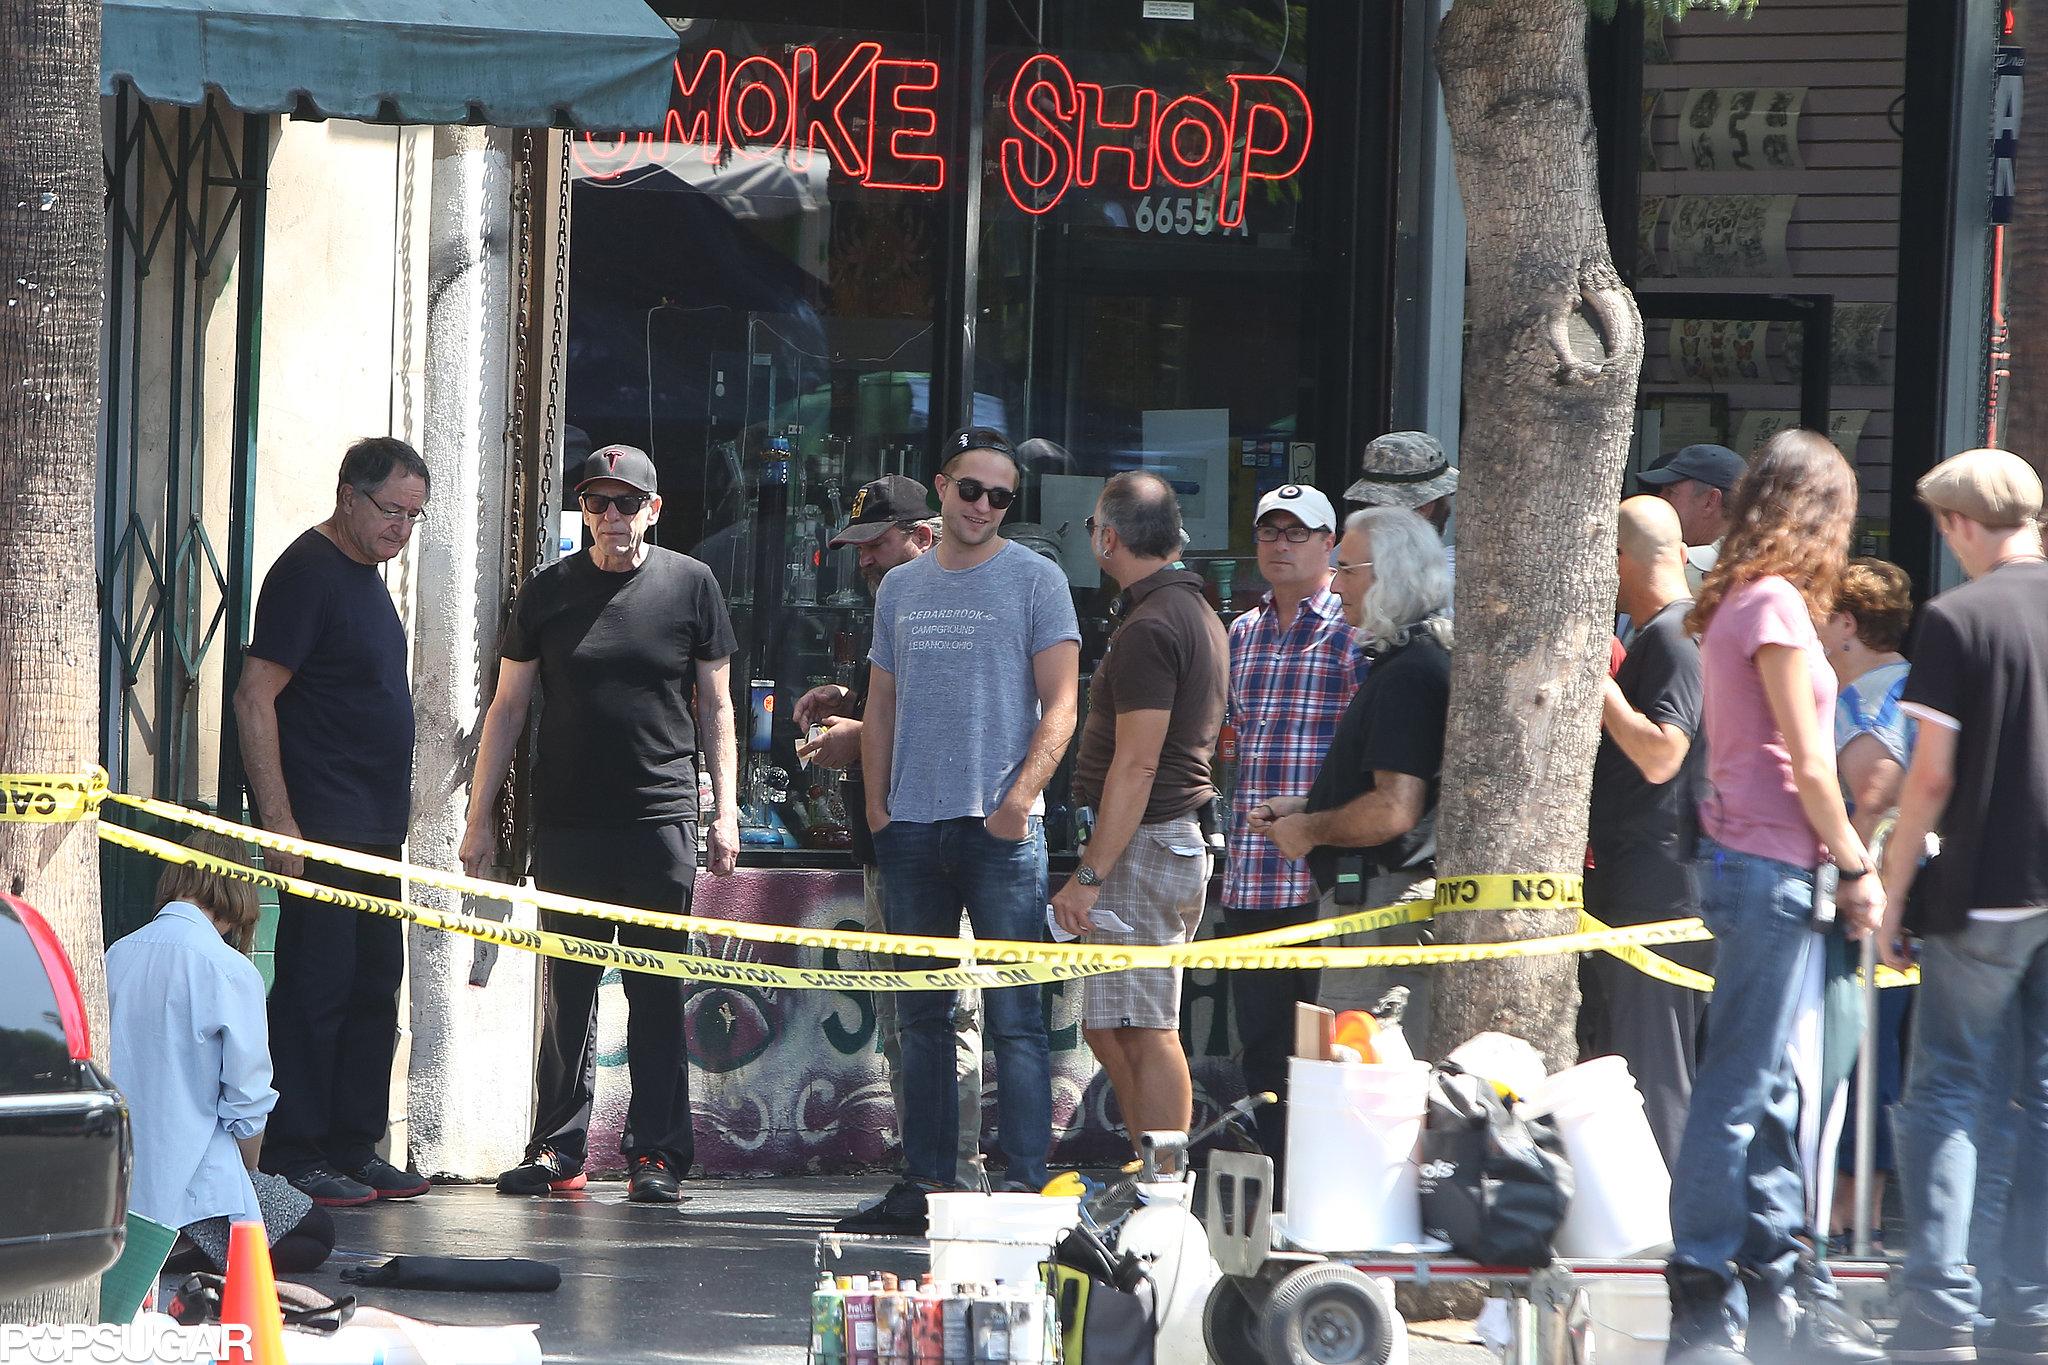 Robert Pattinson wore a gray t-shirt and a backwards hat on set.